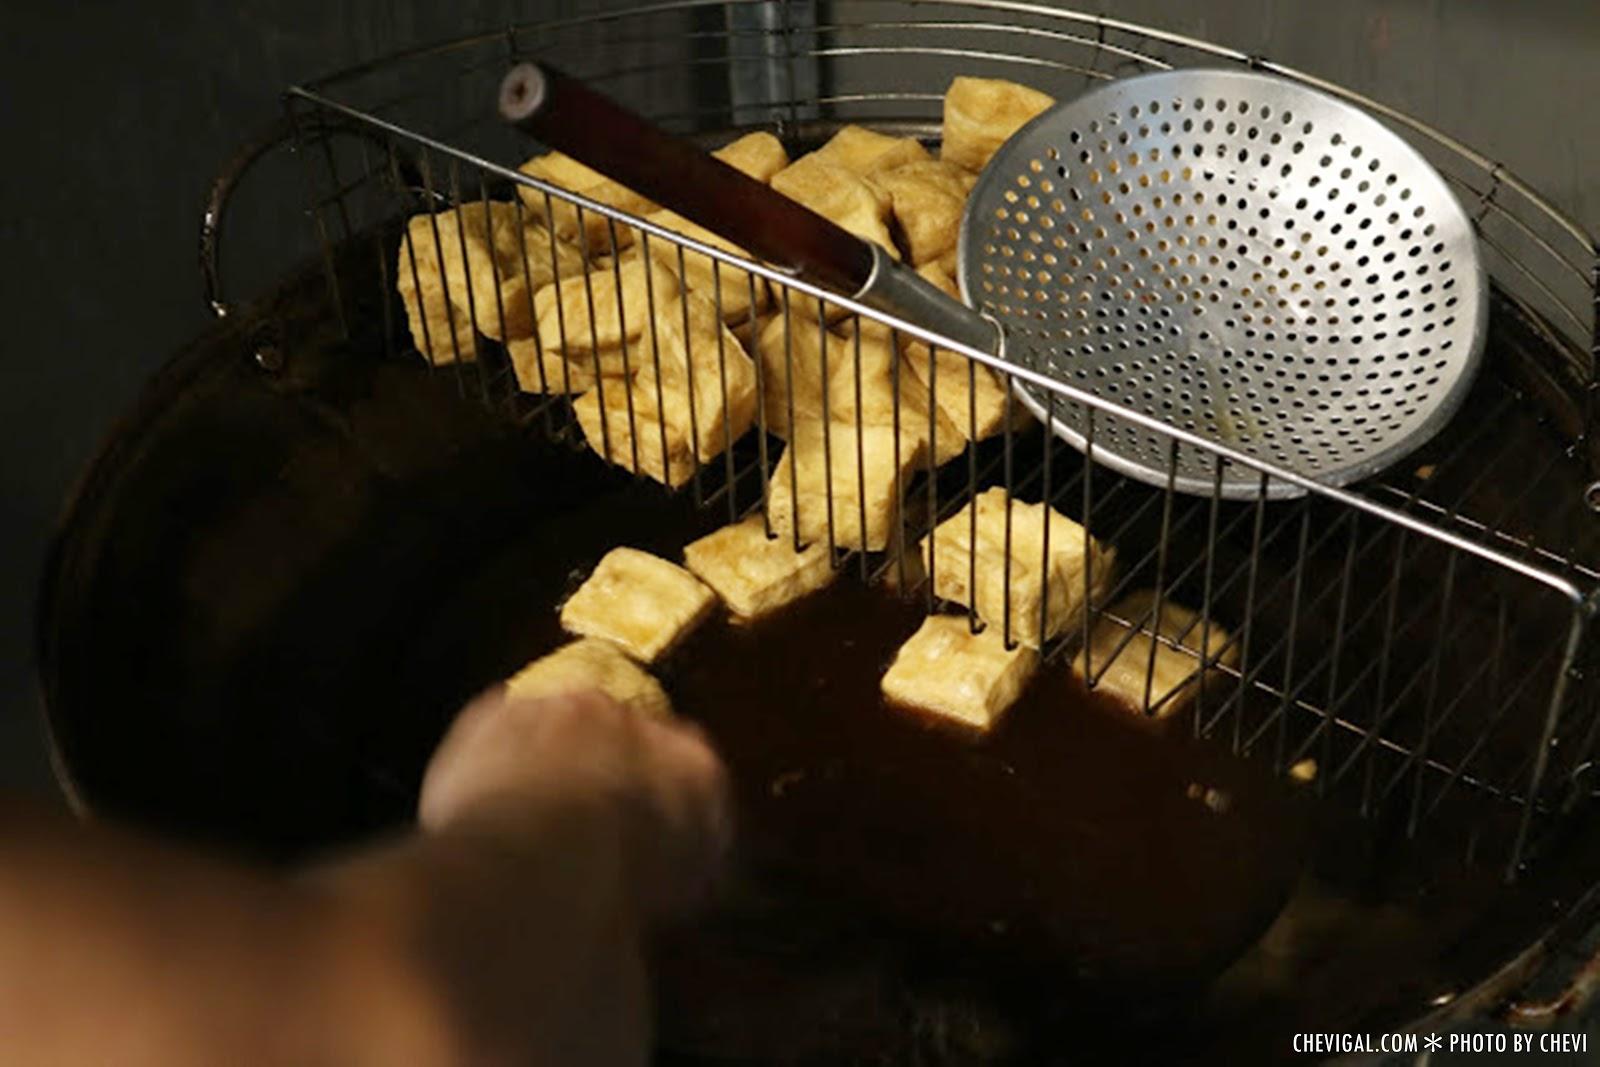 IMG 0646 - 台中烏日│正老牌太祖魷魚羹。隱藏多時的在地美味。臭豆腐終於強勢回歸啦!